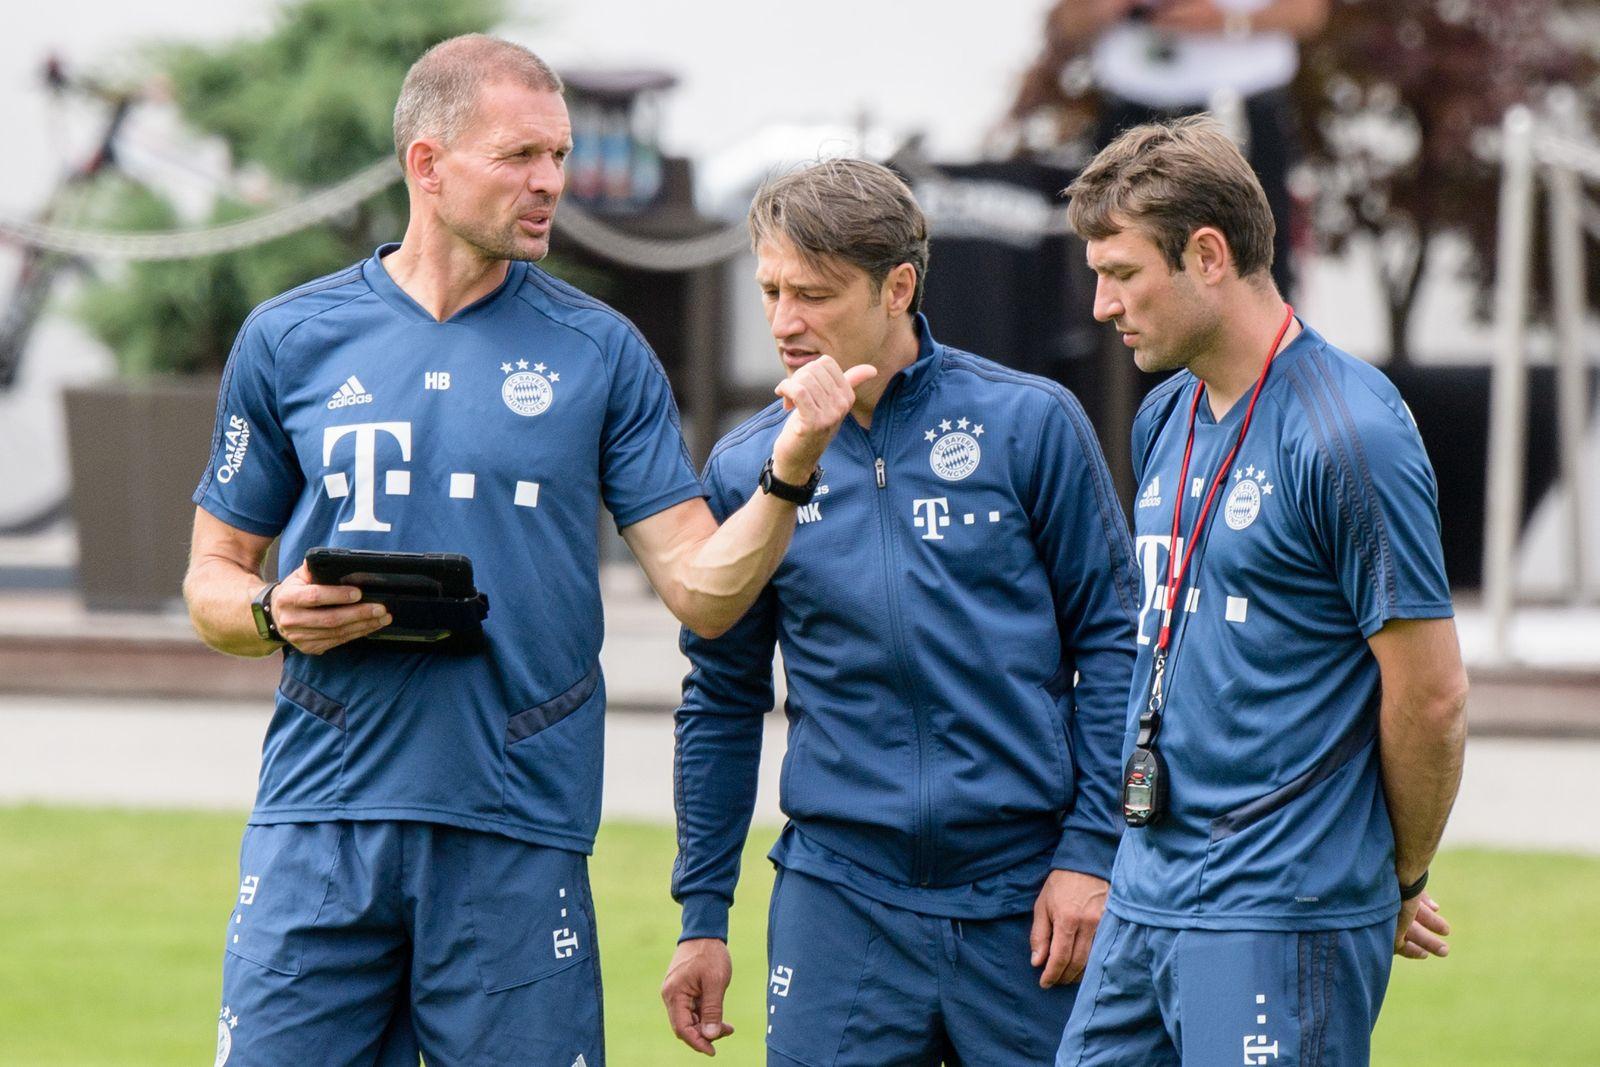 Training FC Bayern